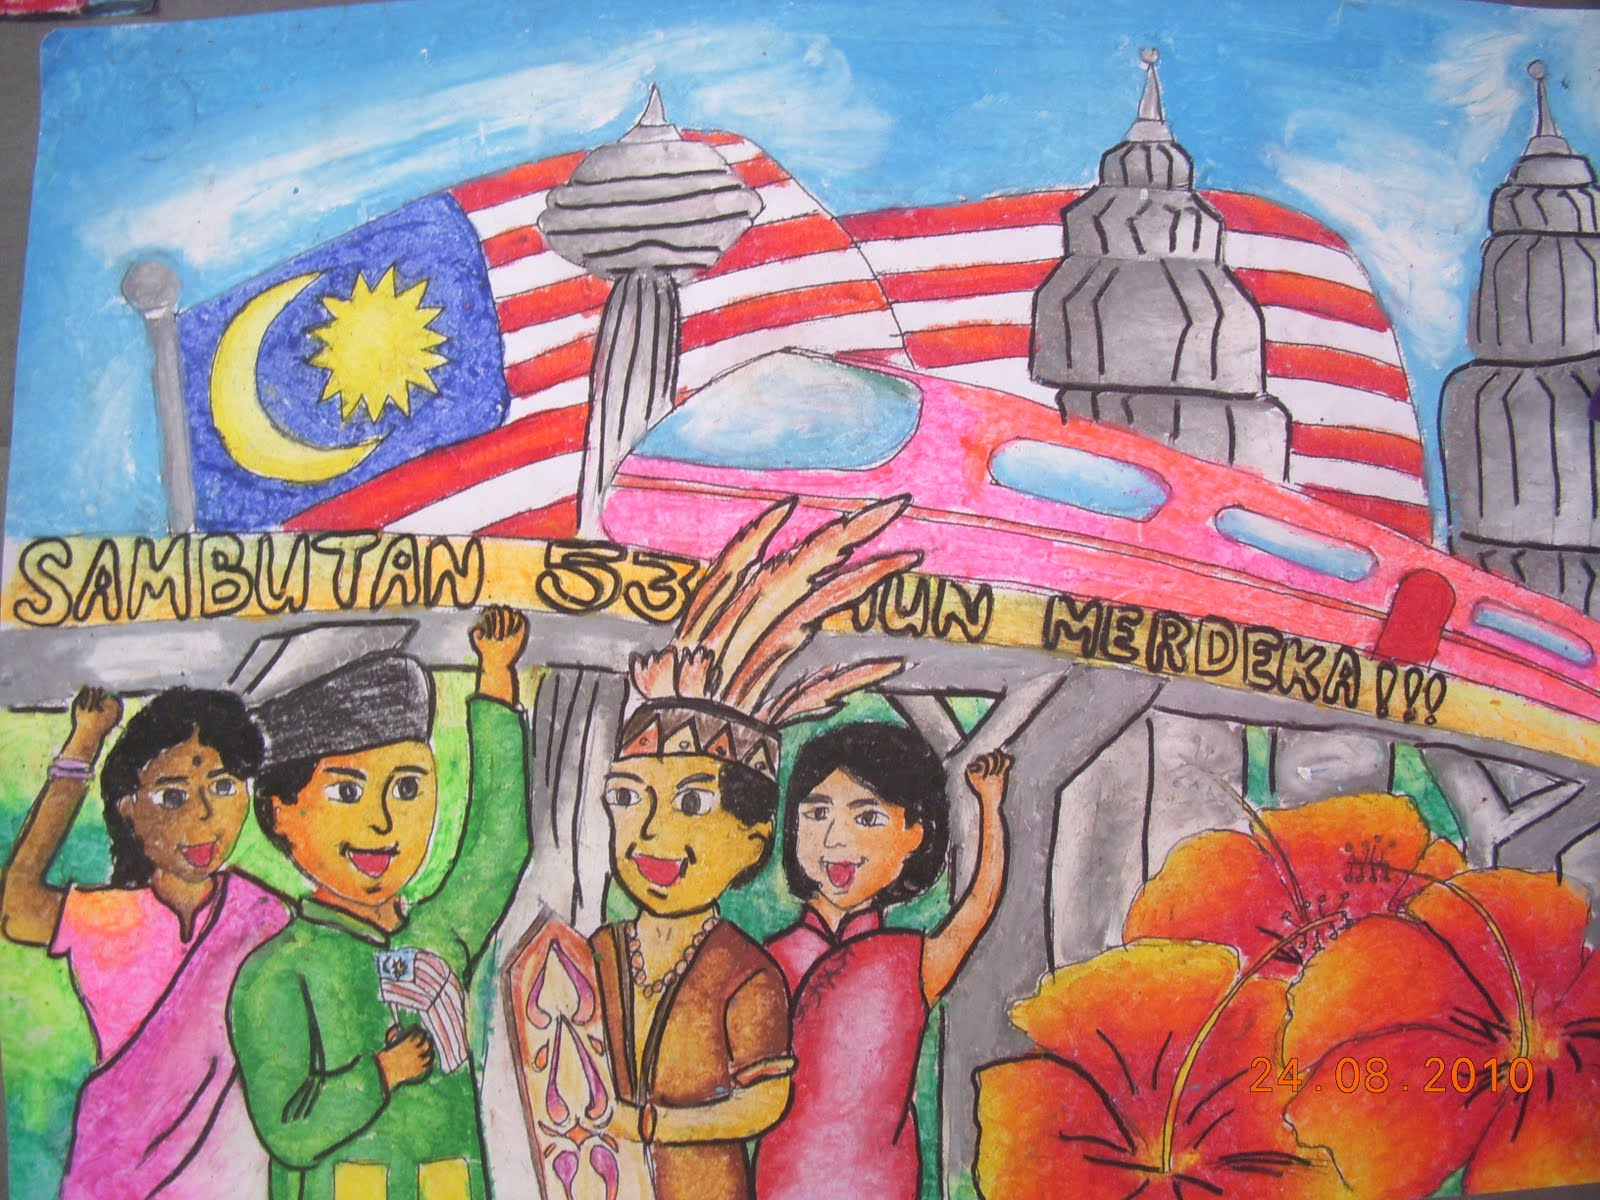 Download image Lukisan Poster Kemerdekaan Terkini PC, Android, iPhone ...